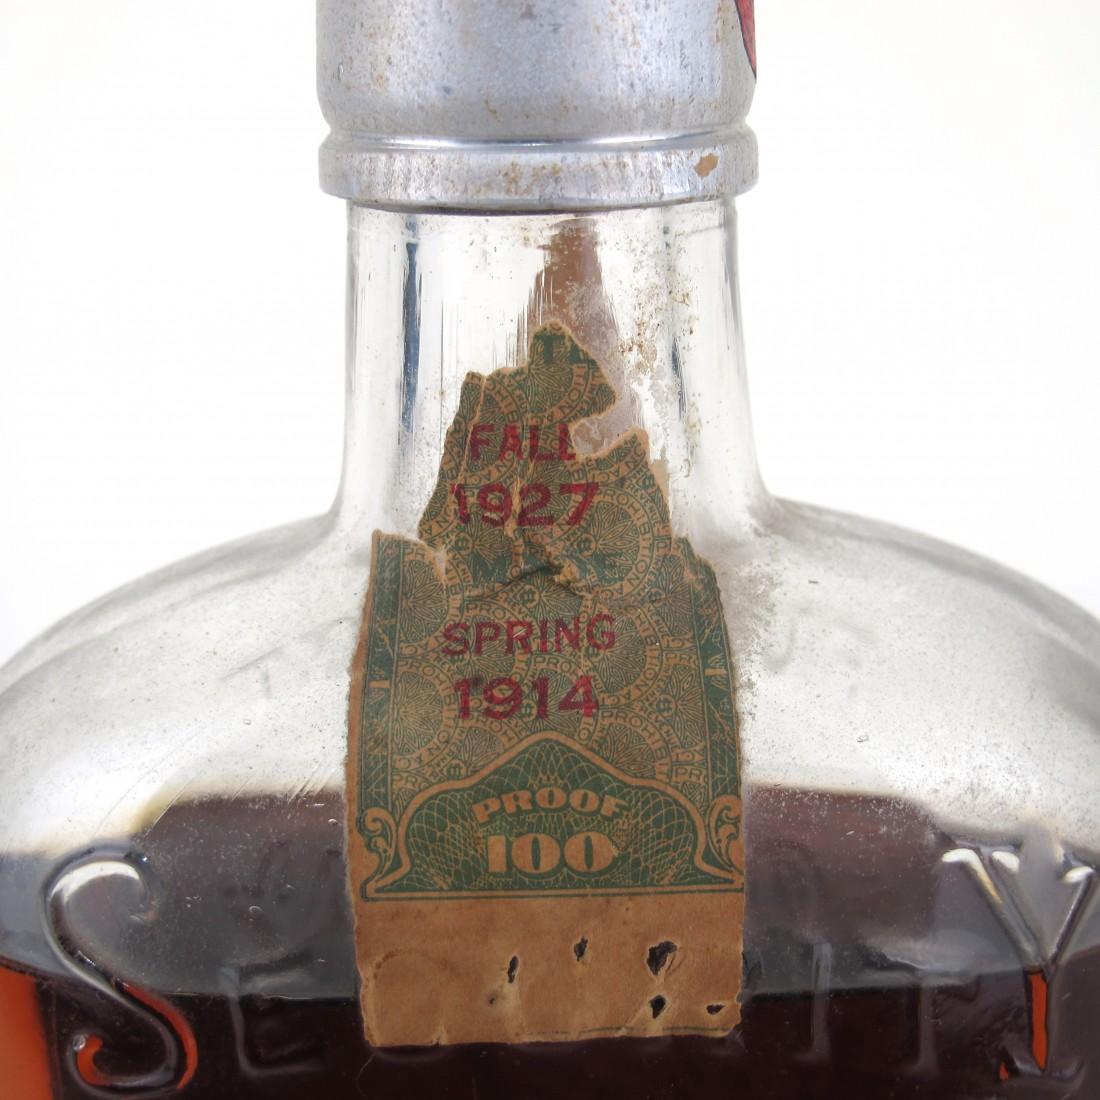 Old Spring Brook 1914 Kentucky Whiskey / Bottled 1927